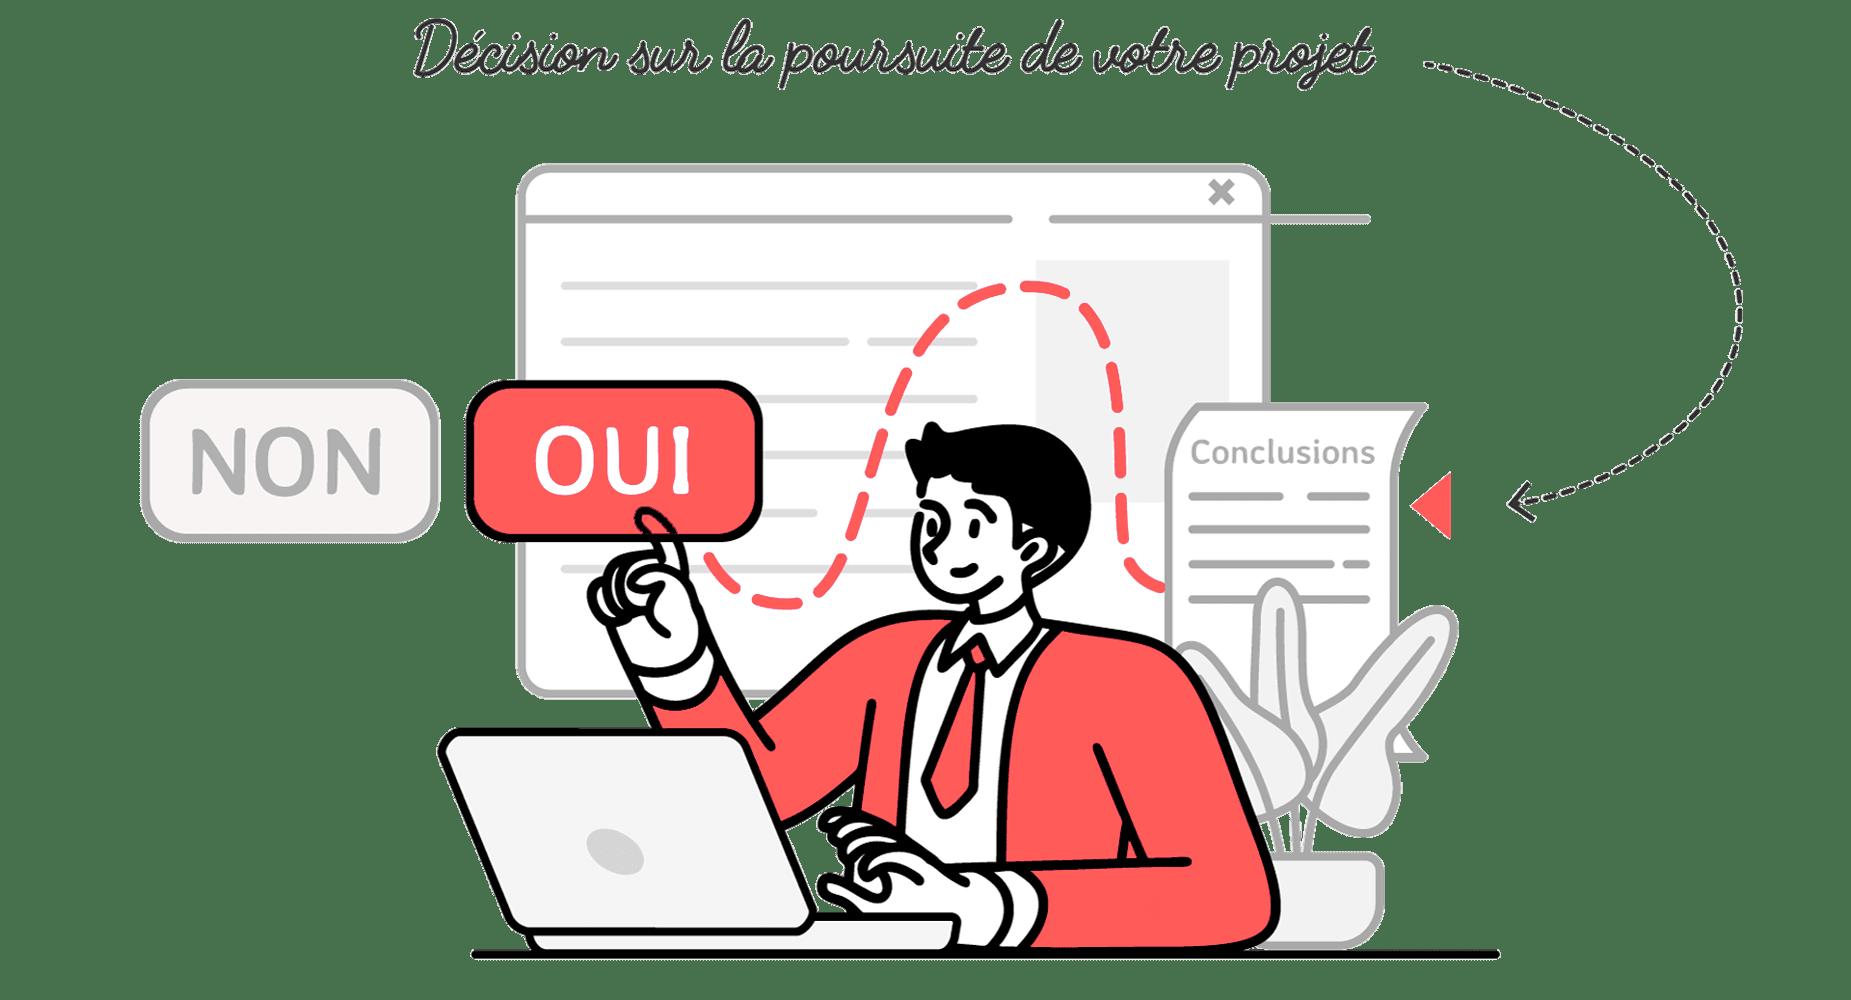 Validation graphisme et impression - OUI Are Web Agence de communication branding Bruxelles